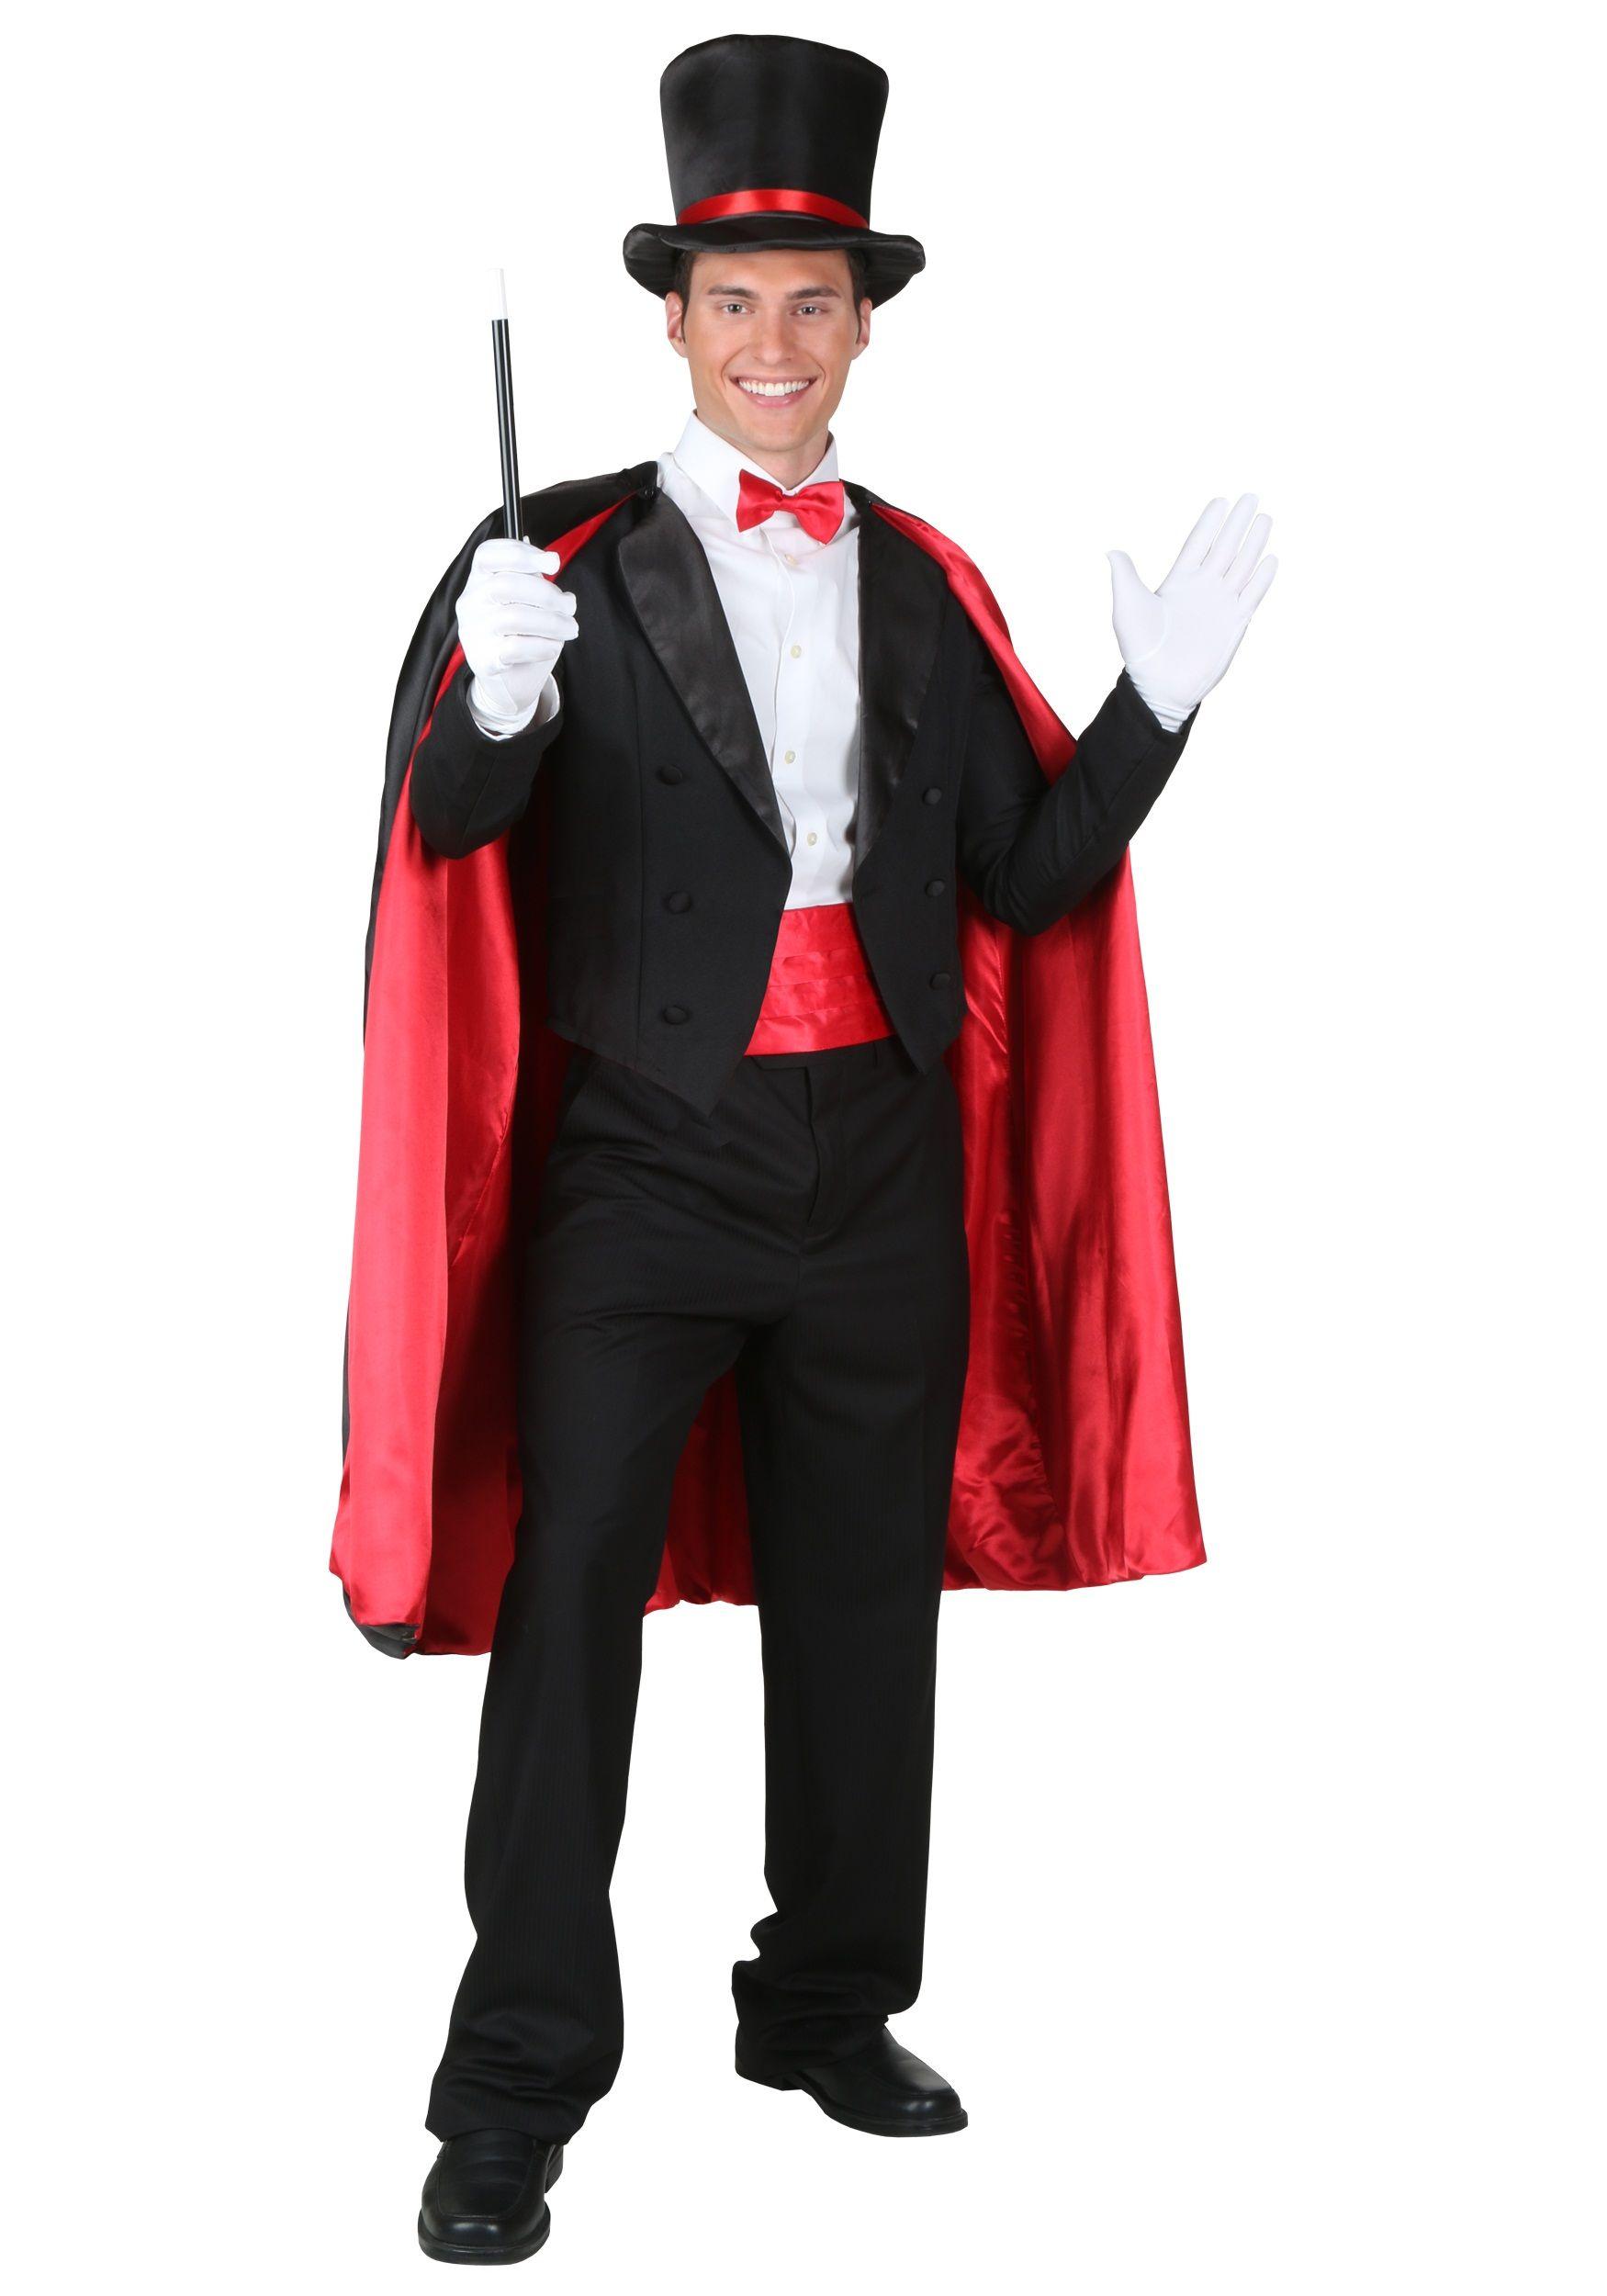 Adult Magic Magician Costume   Kid, Halloween costumes and Halloween